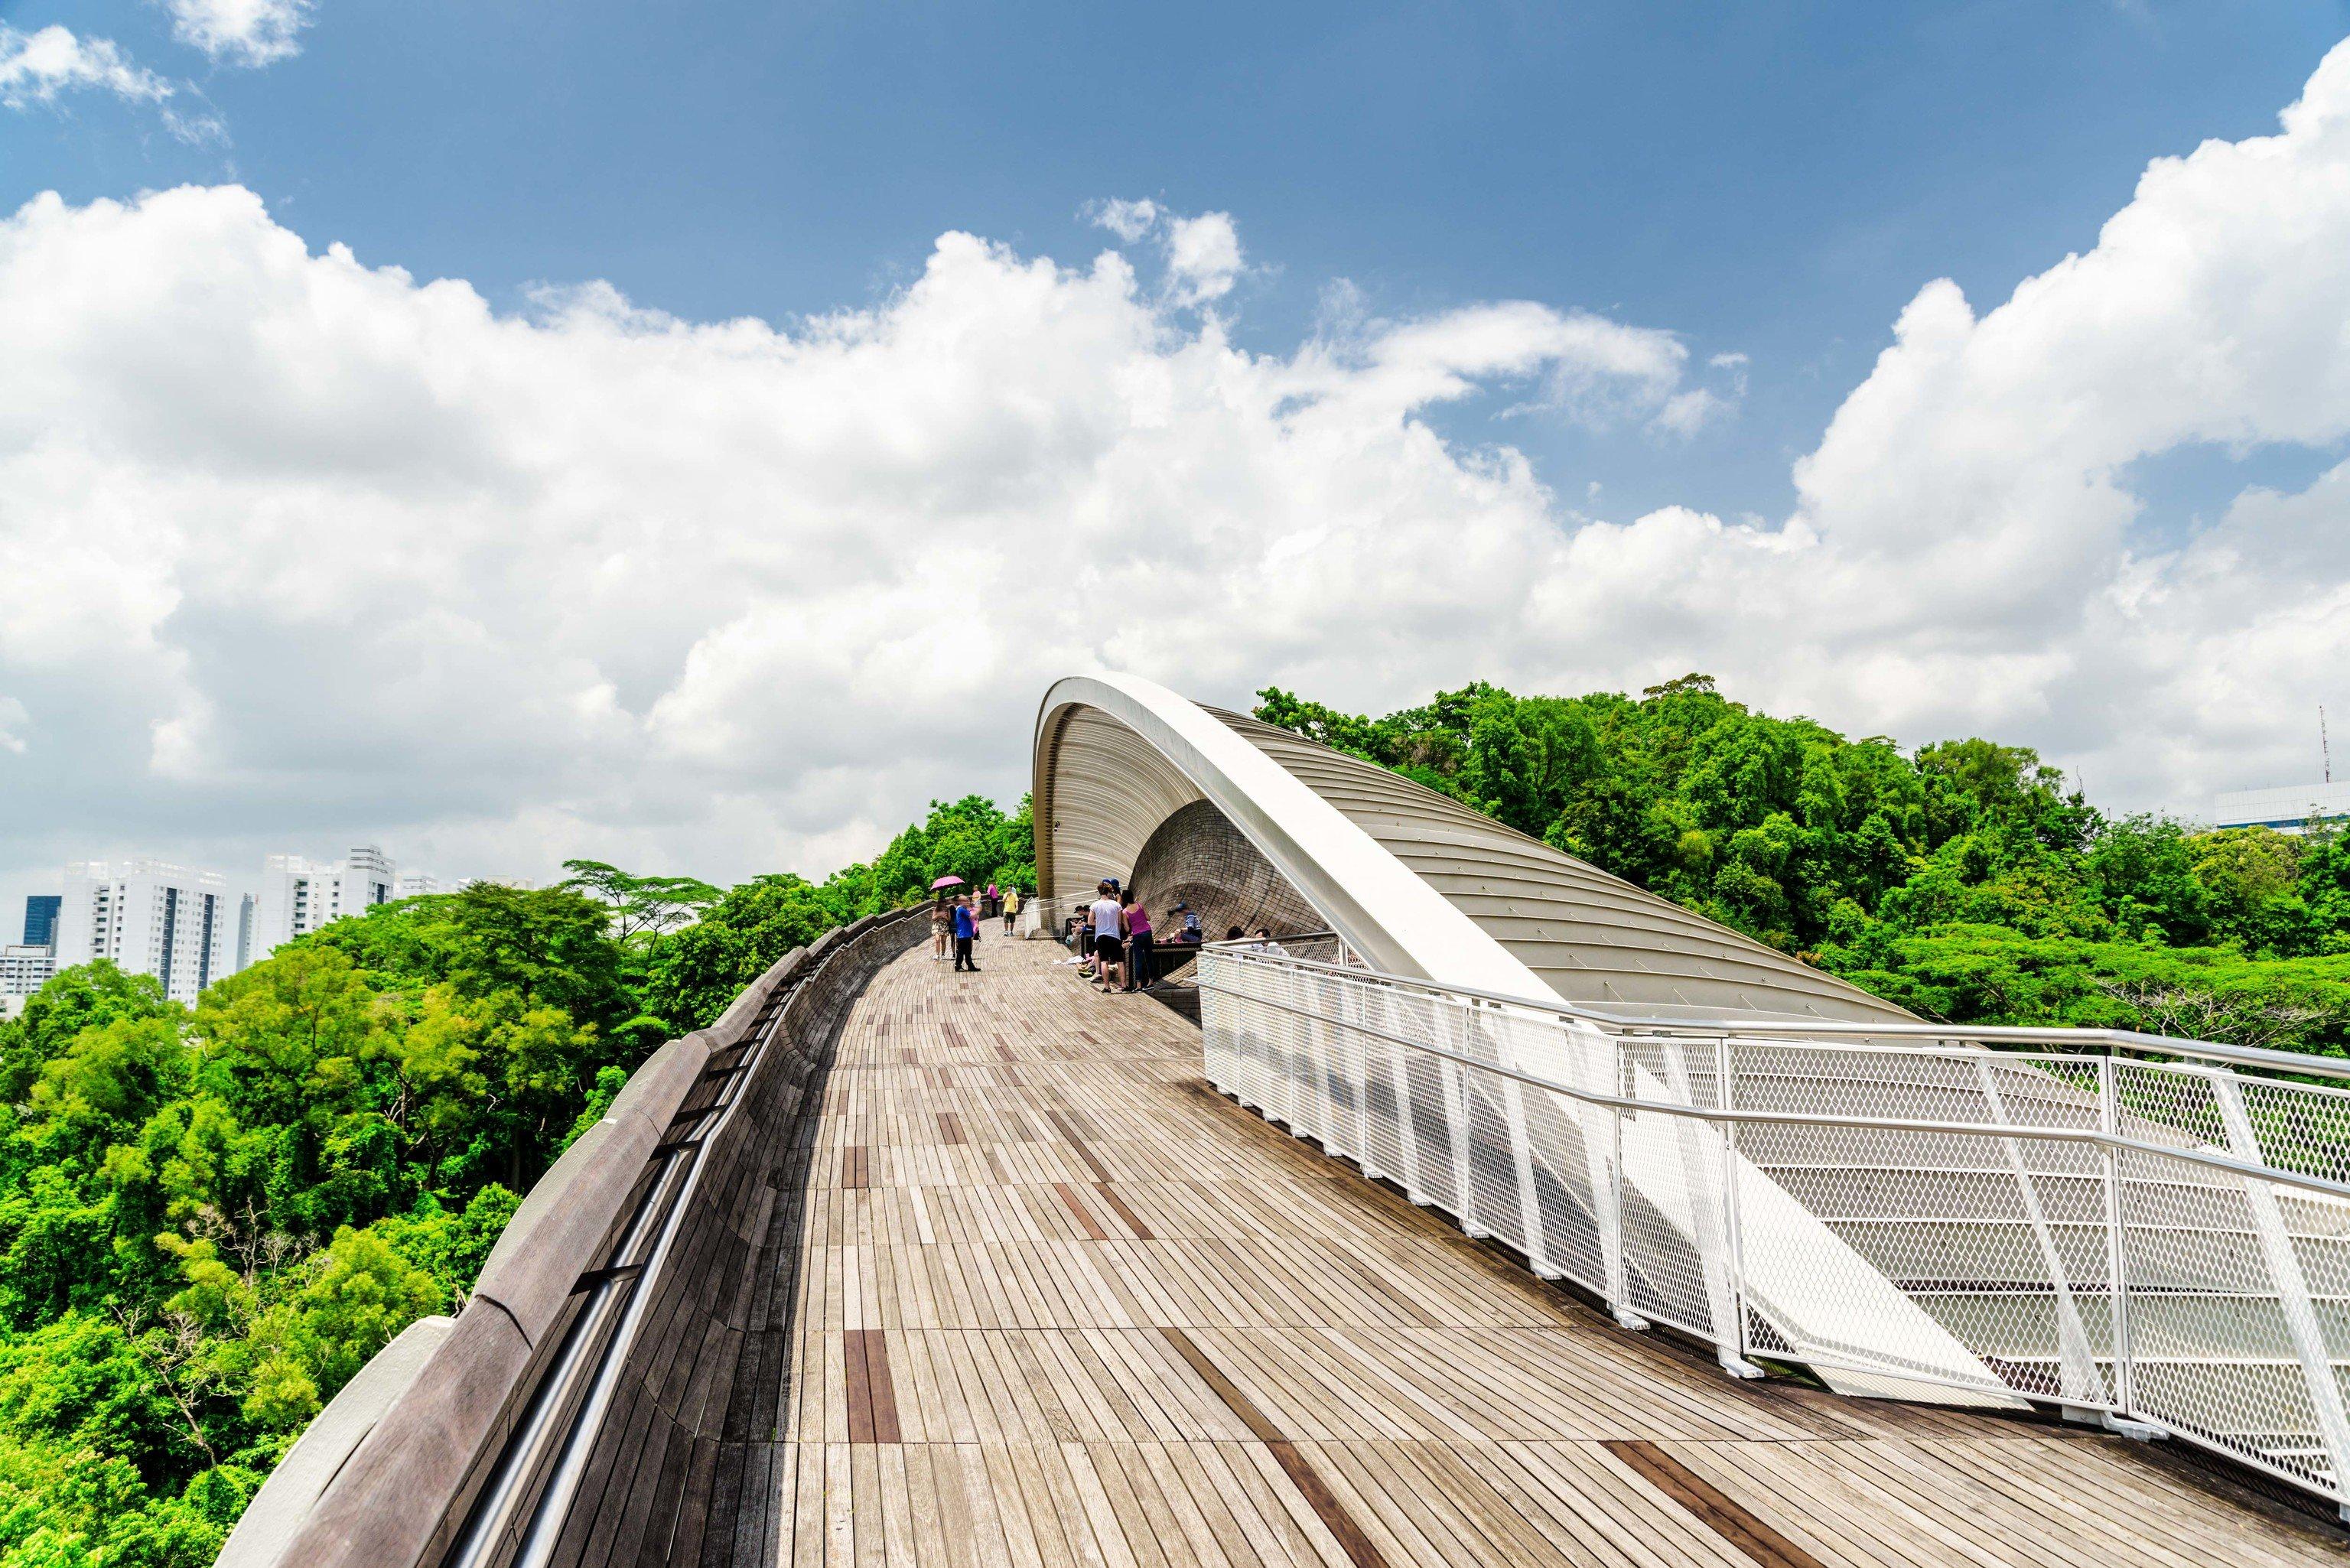 Offbeat Singapore Trip Ideas sky cloud tree bridge plant fixed link walkway leisure roof outdoor structure landscape boardwalk tourism vacation